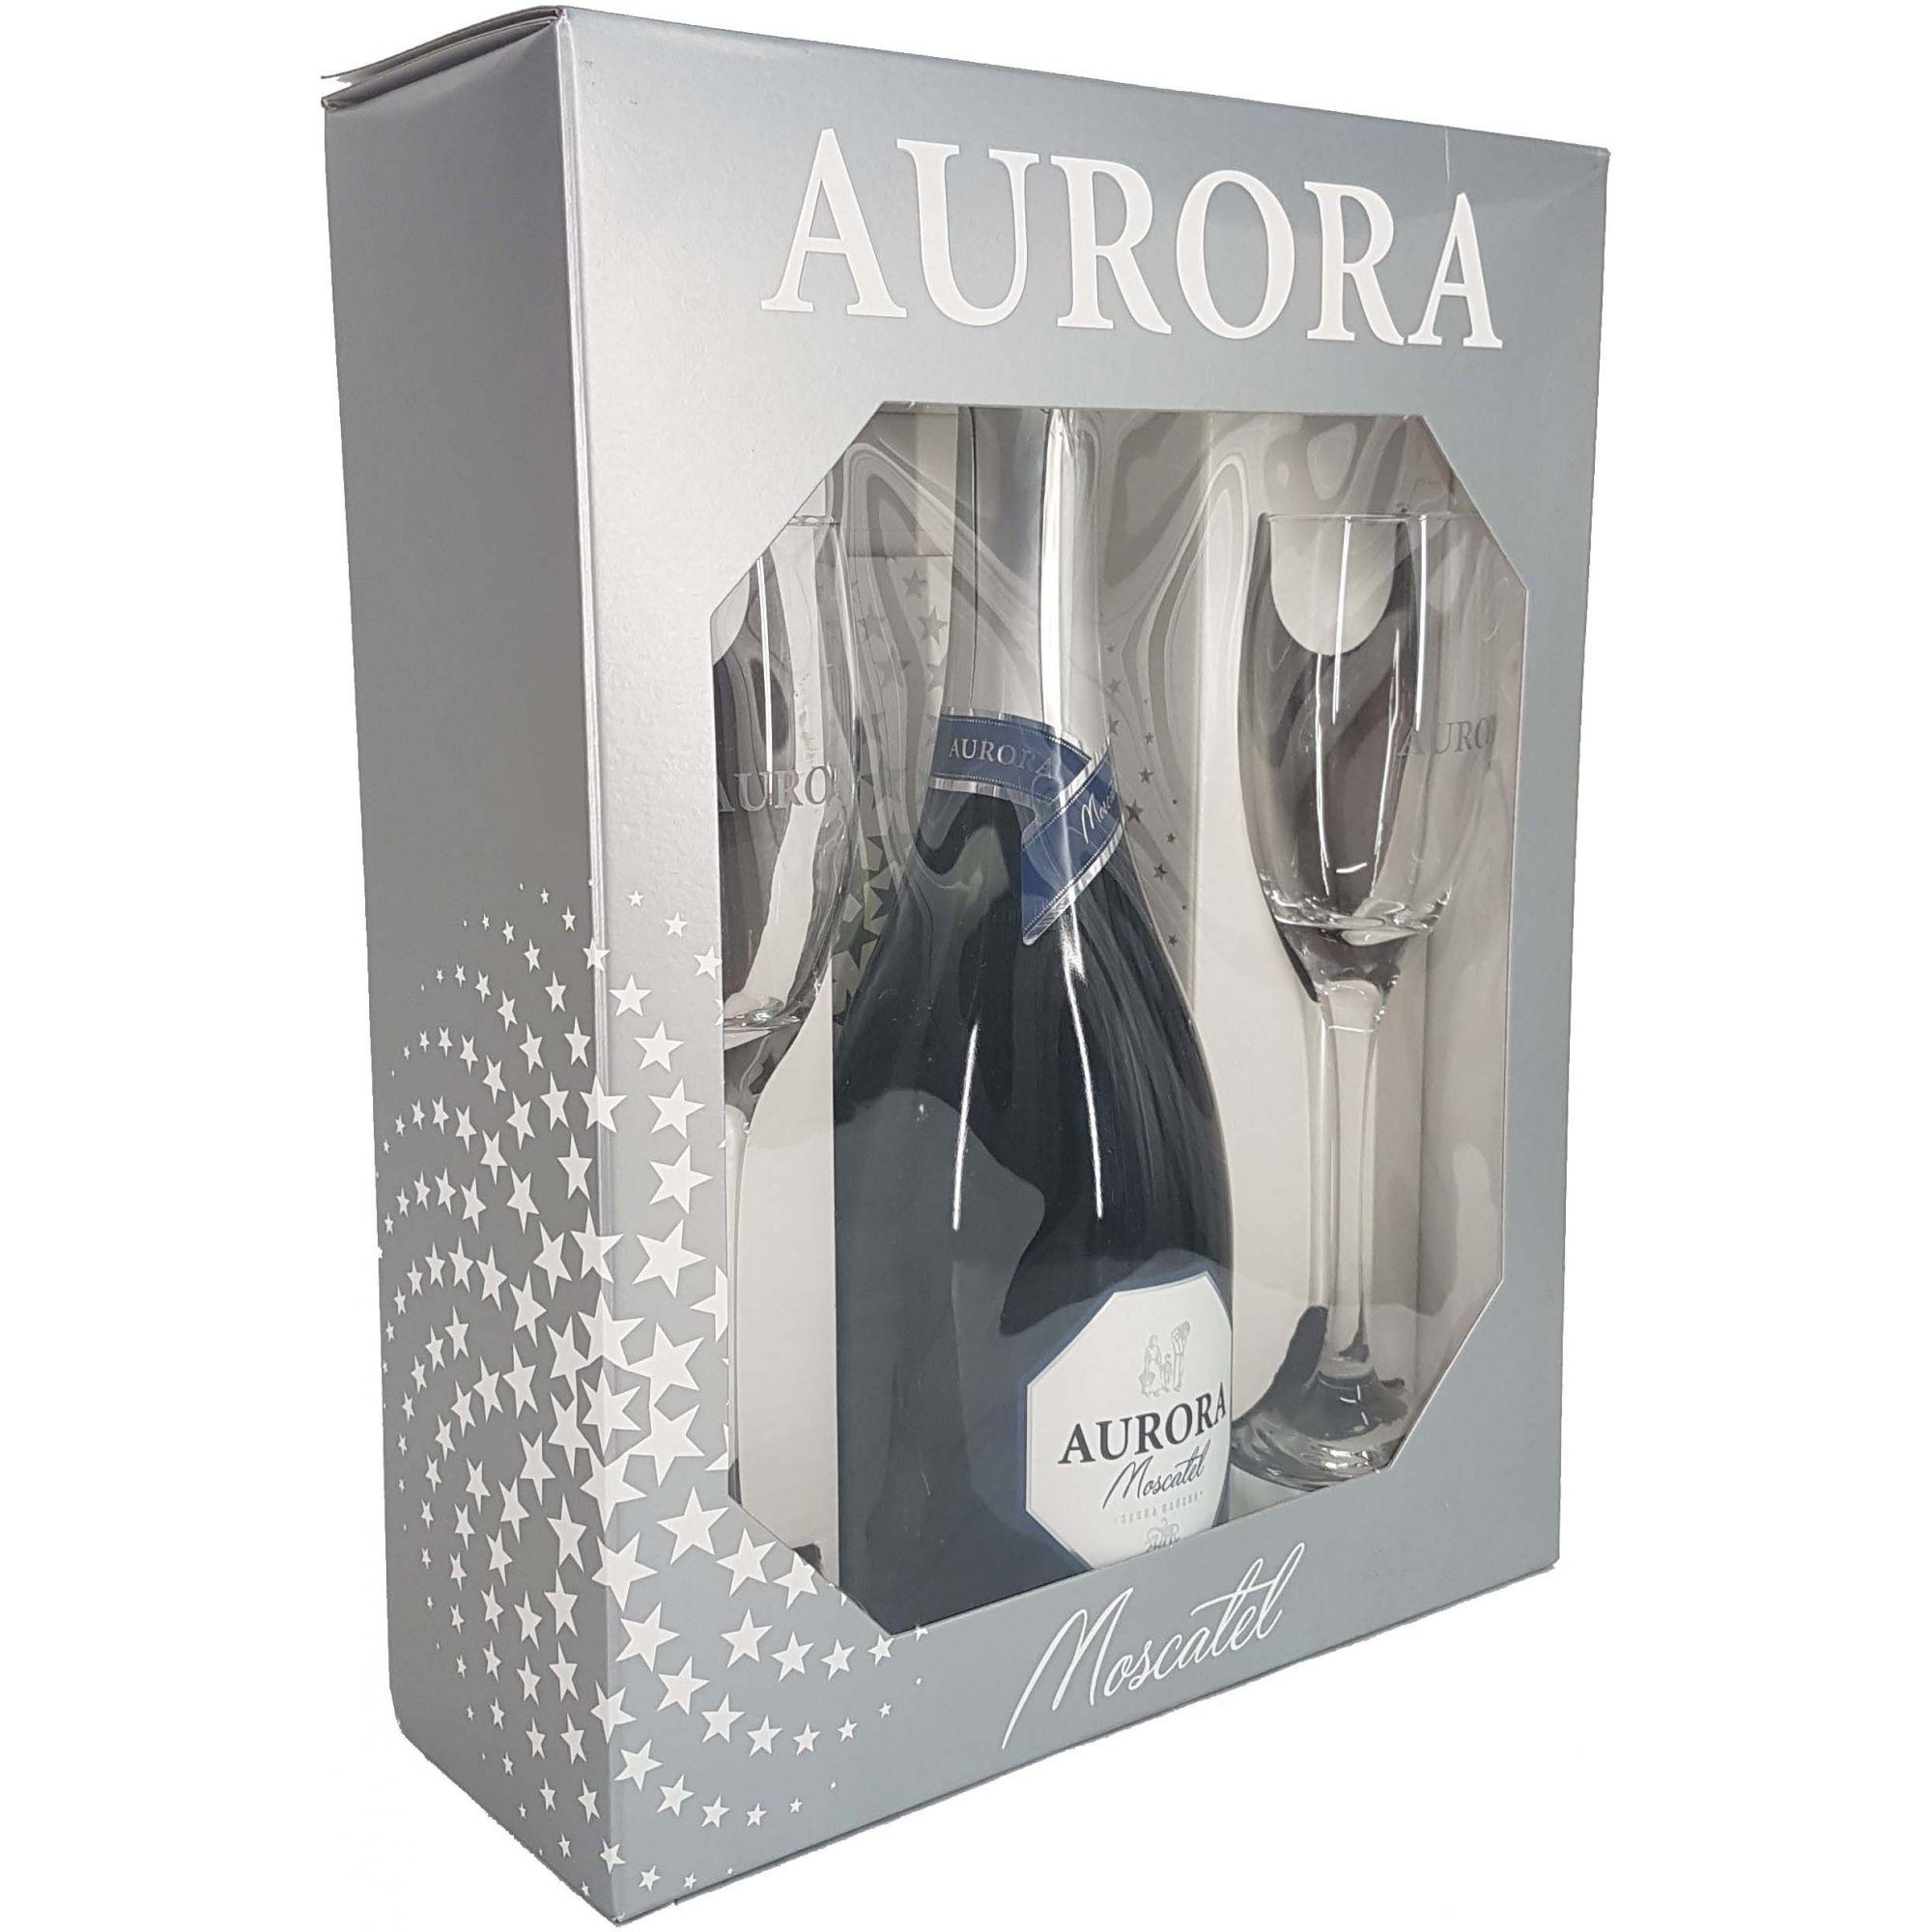 Kit Espumante Moscatel Aurora + 2 Taças - 750ml -